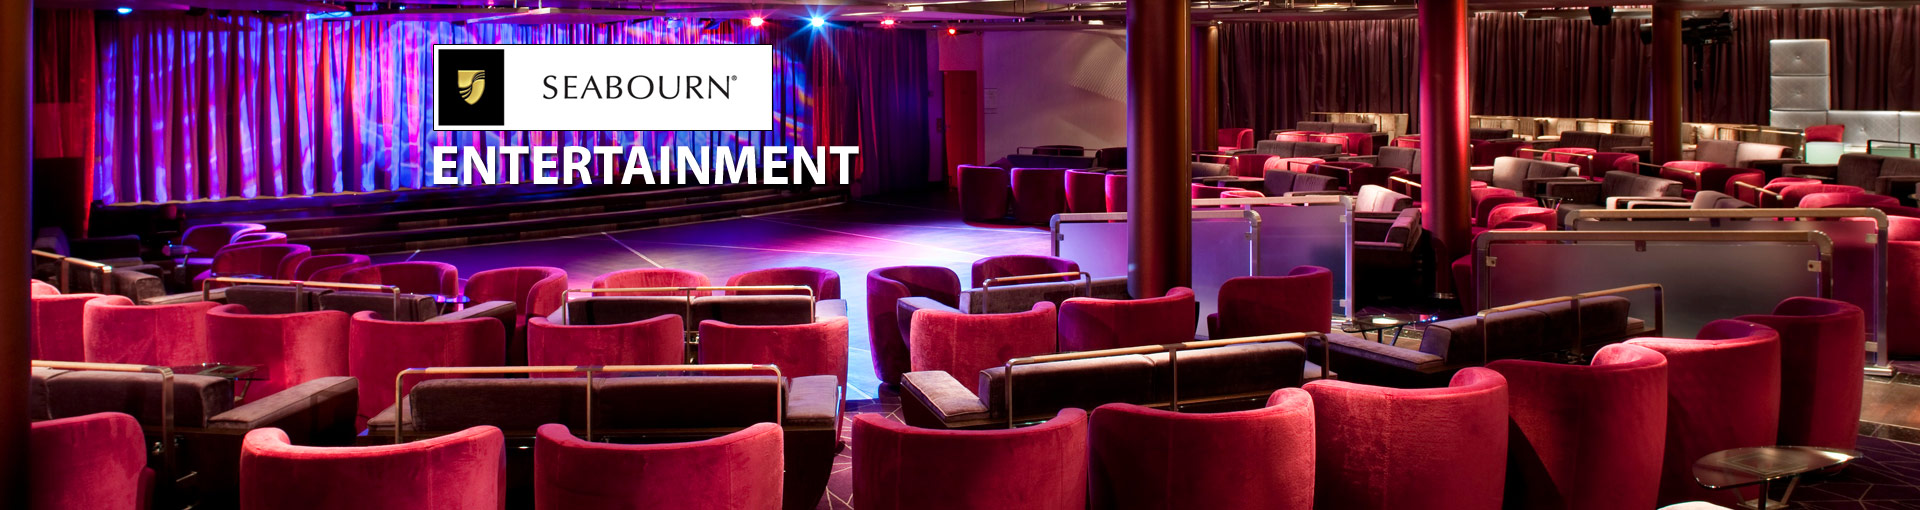 Seabourn Cruise Line Entertainment